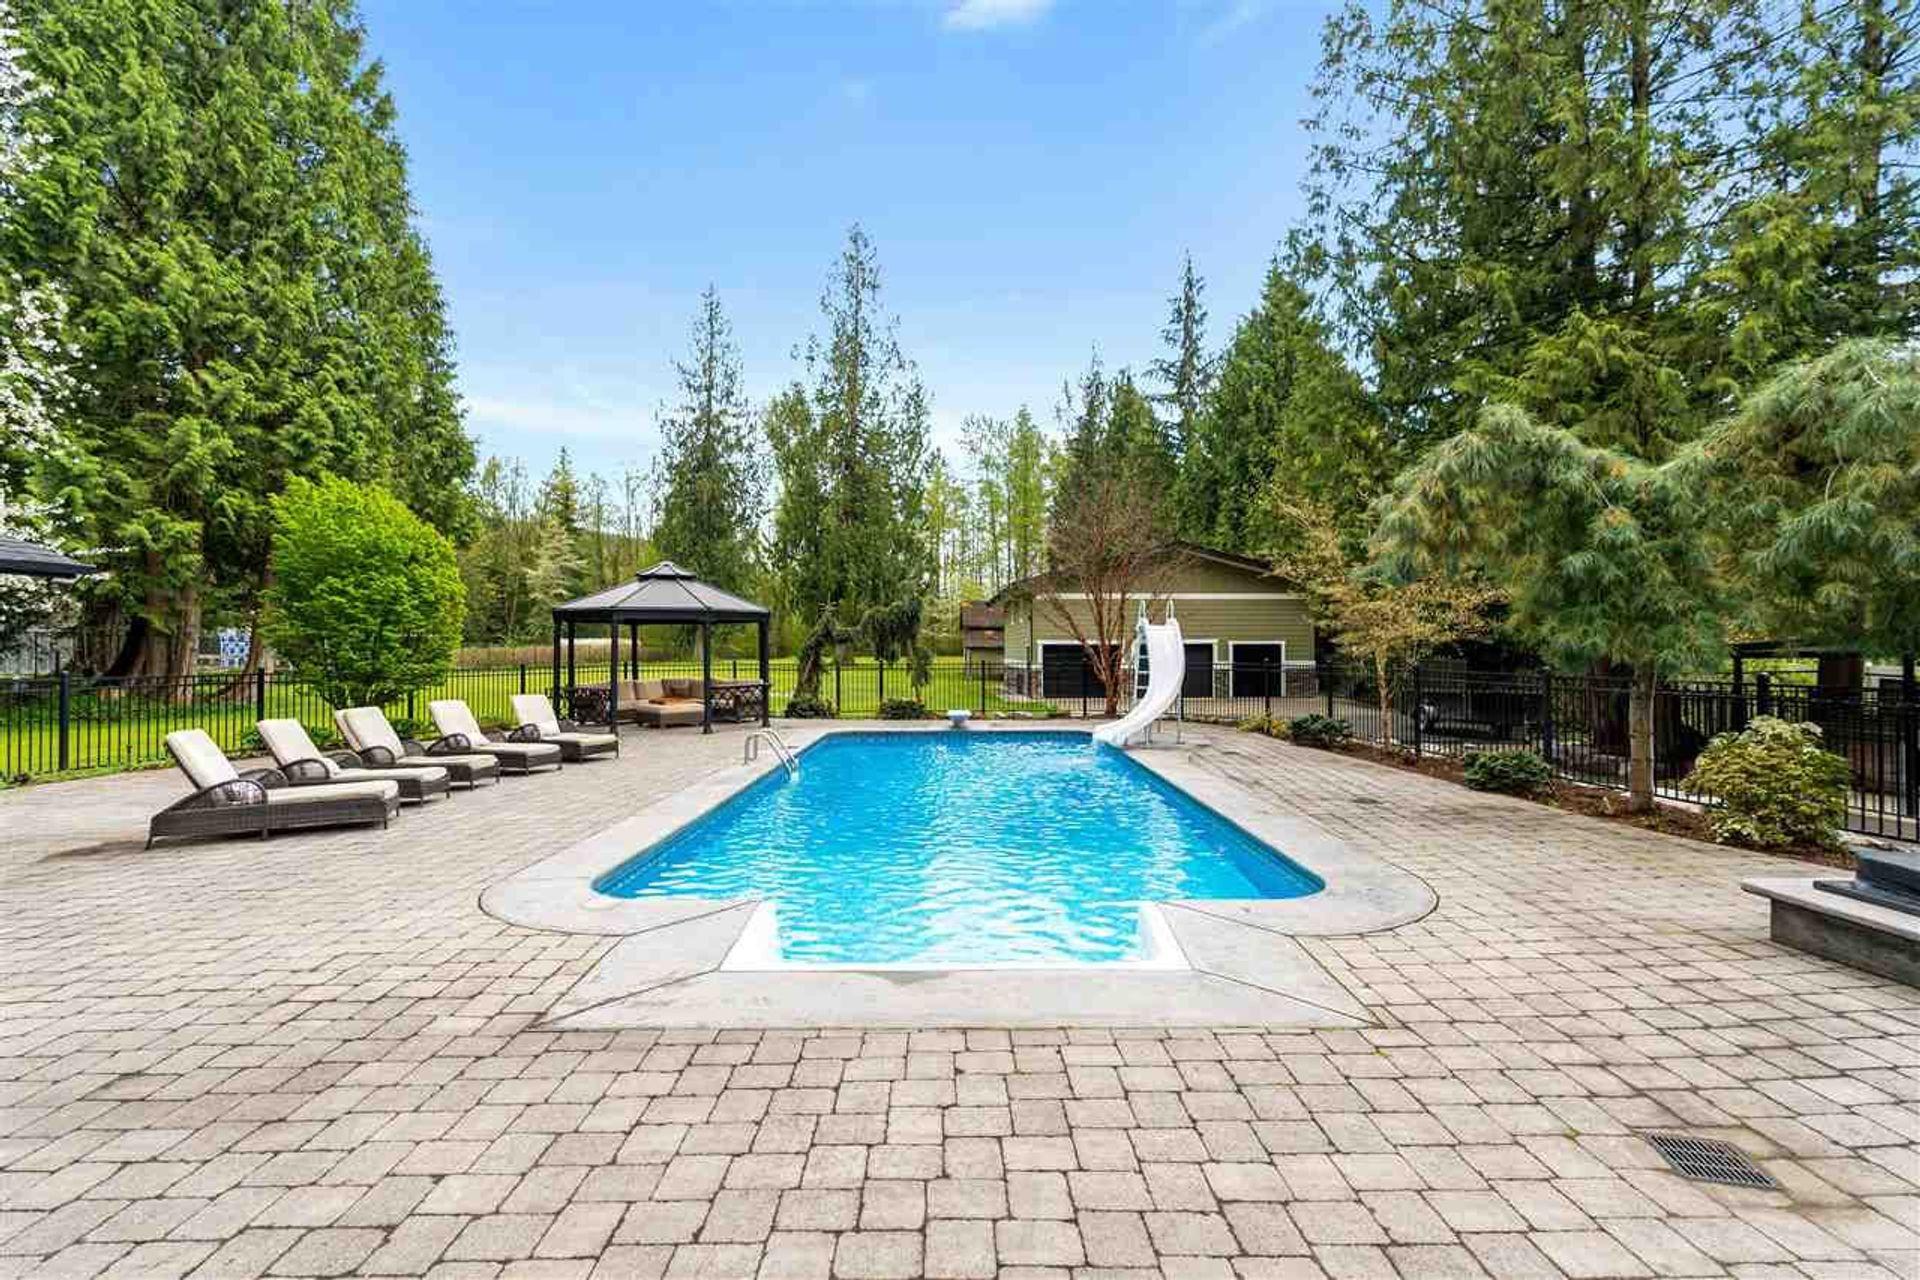 24852-ferguson-avenue-cottonwood-mr-maple-ridge-36 of 24852 Ferguson Avenue, Cottonwood MR, Maple Ridge